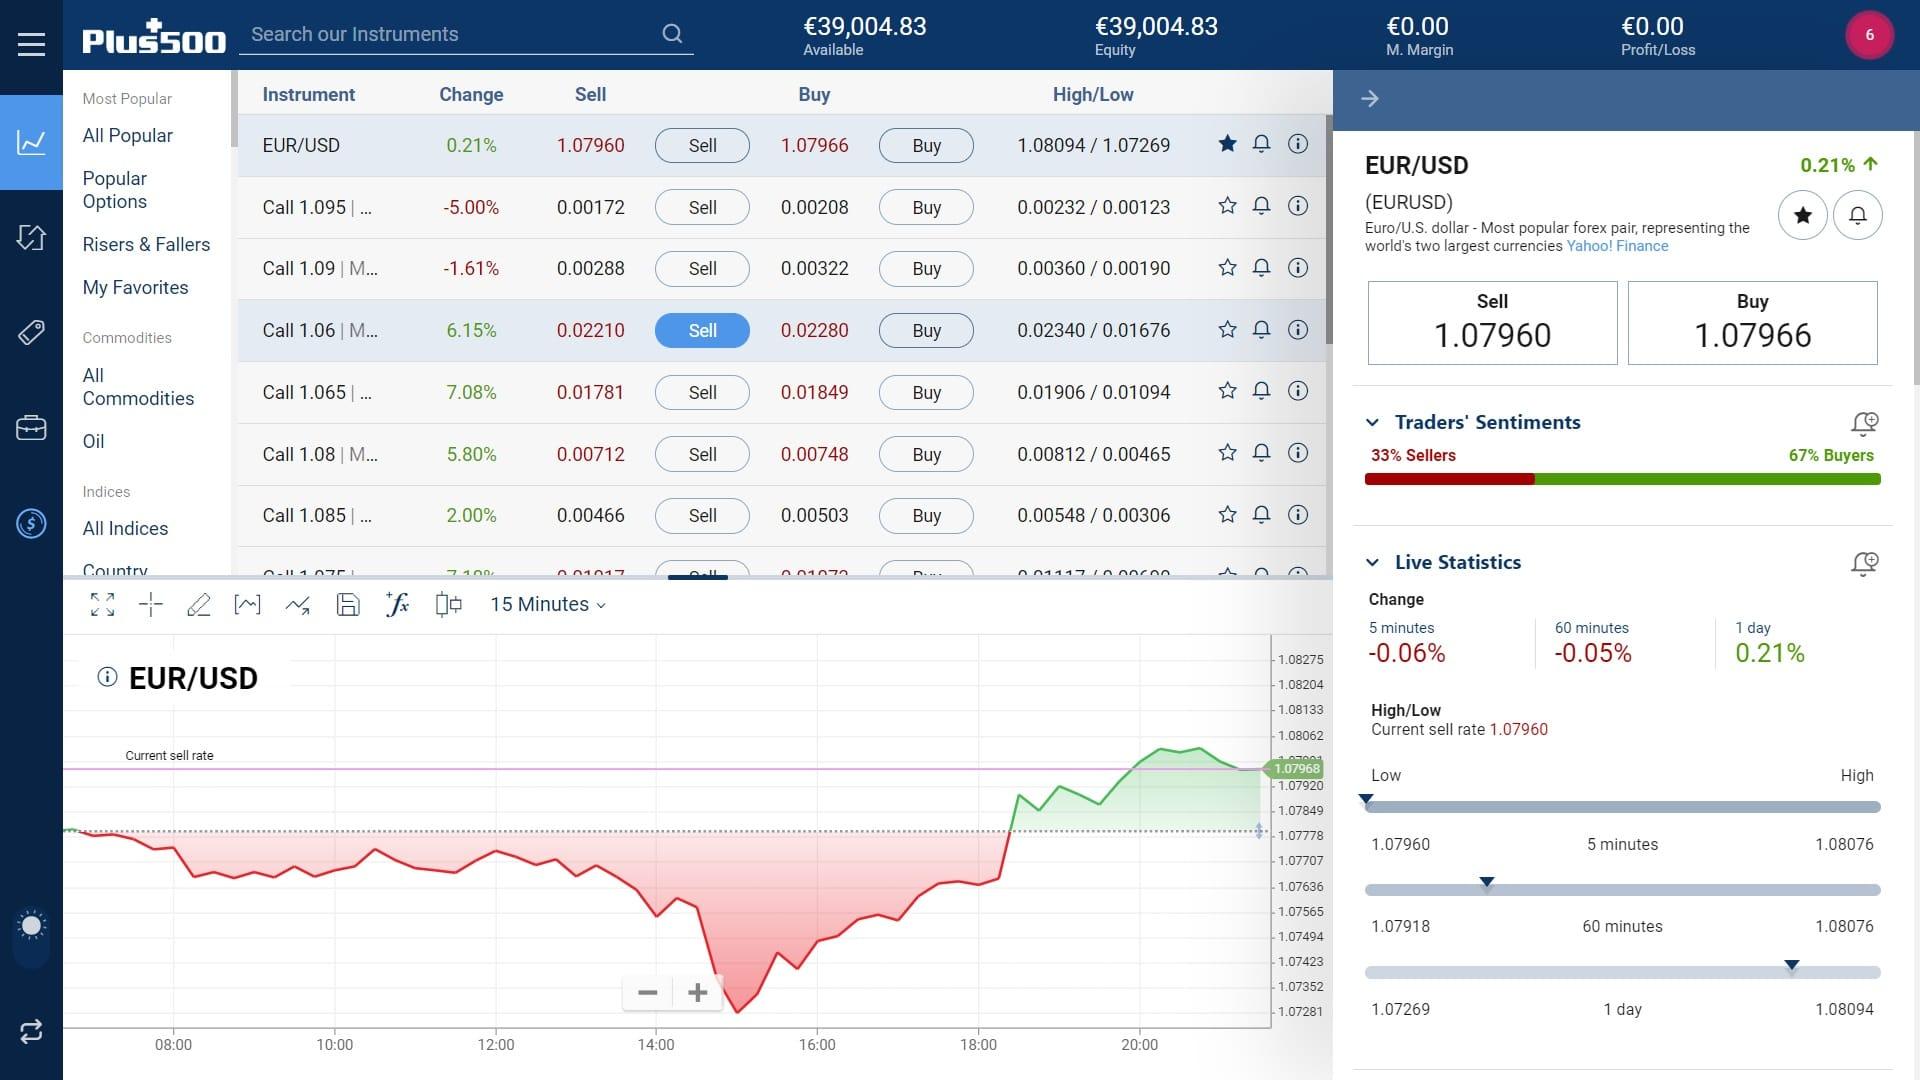 EUR/USD trading on Plus500's platform